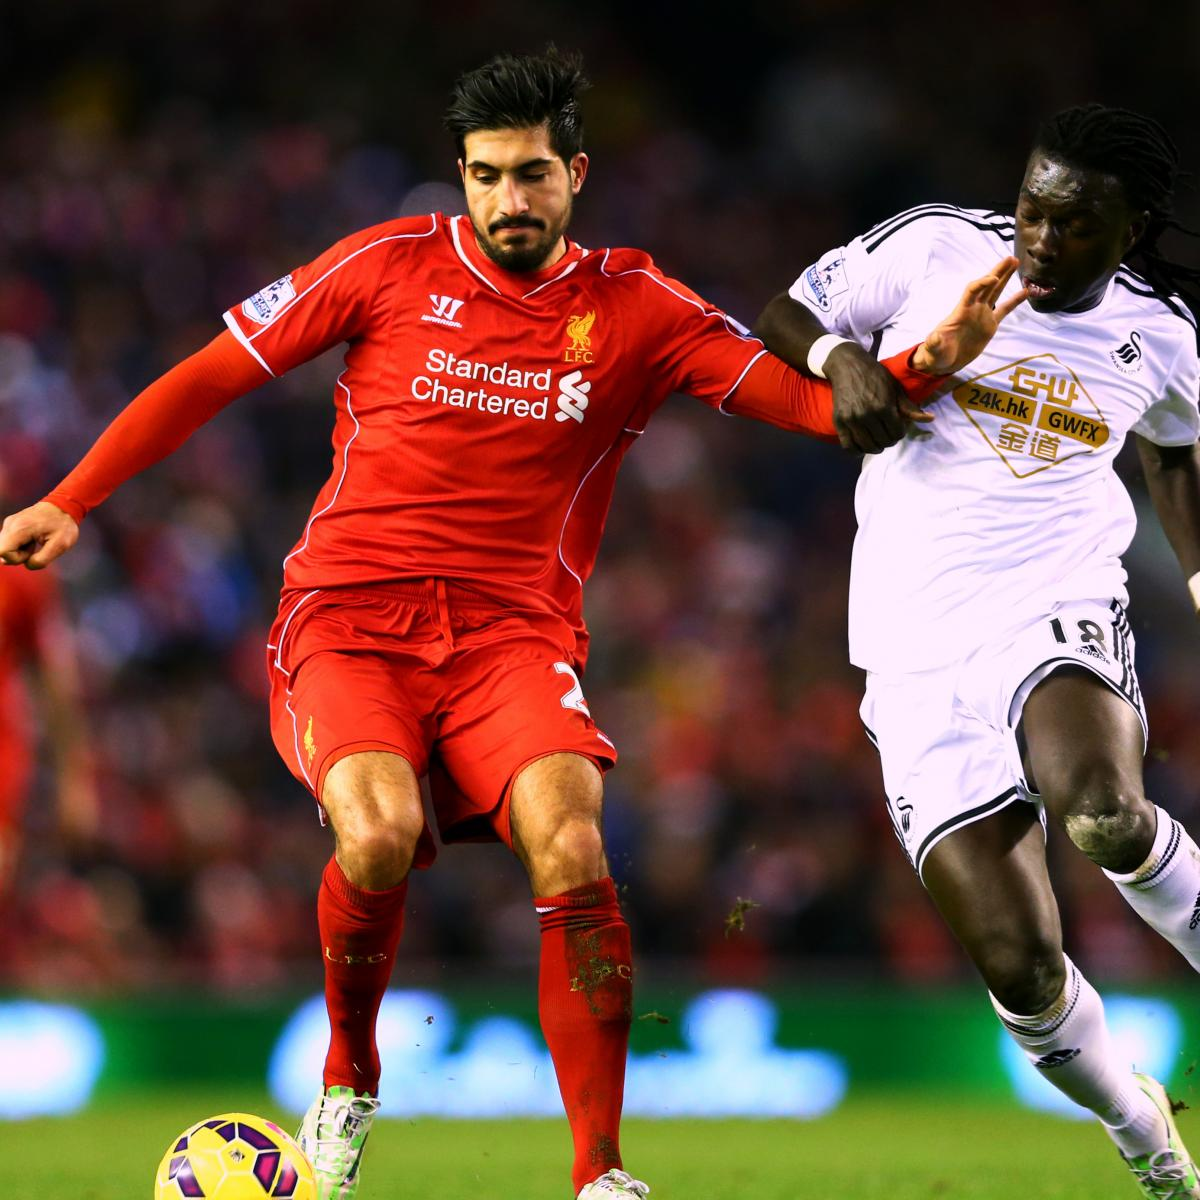 Swansea Liverpool Live Stream